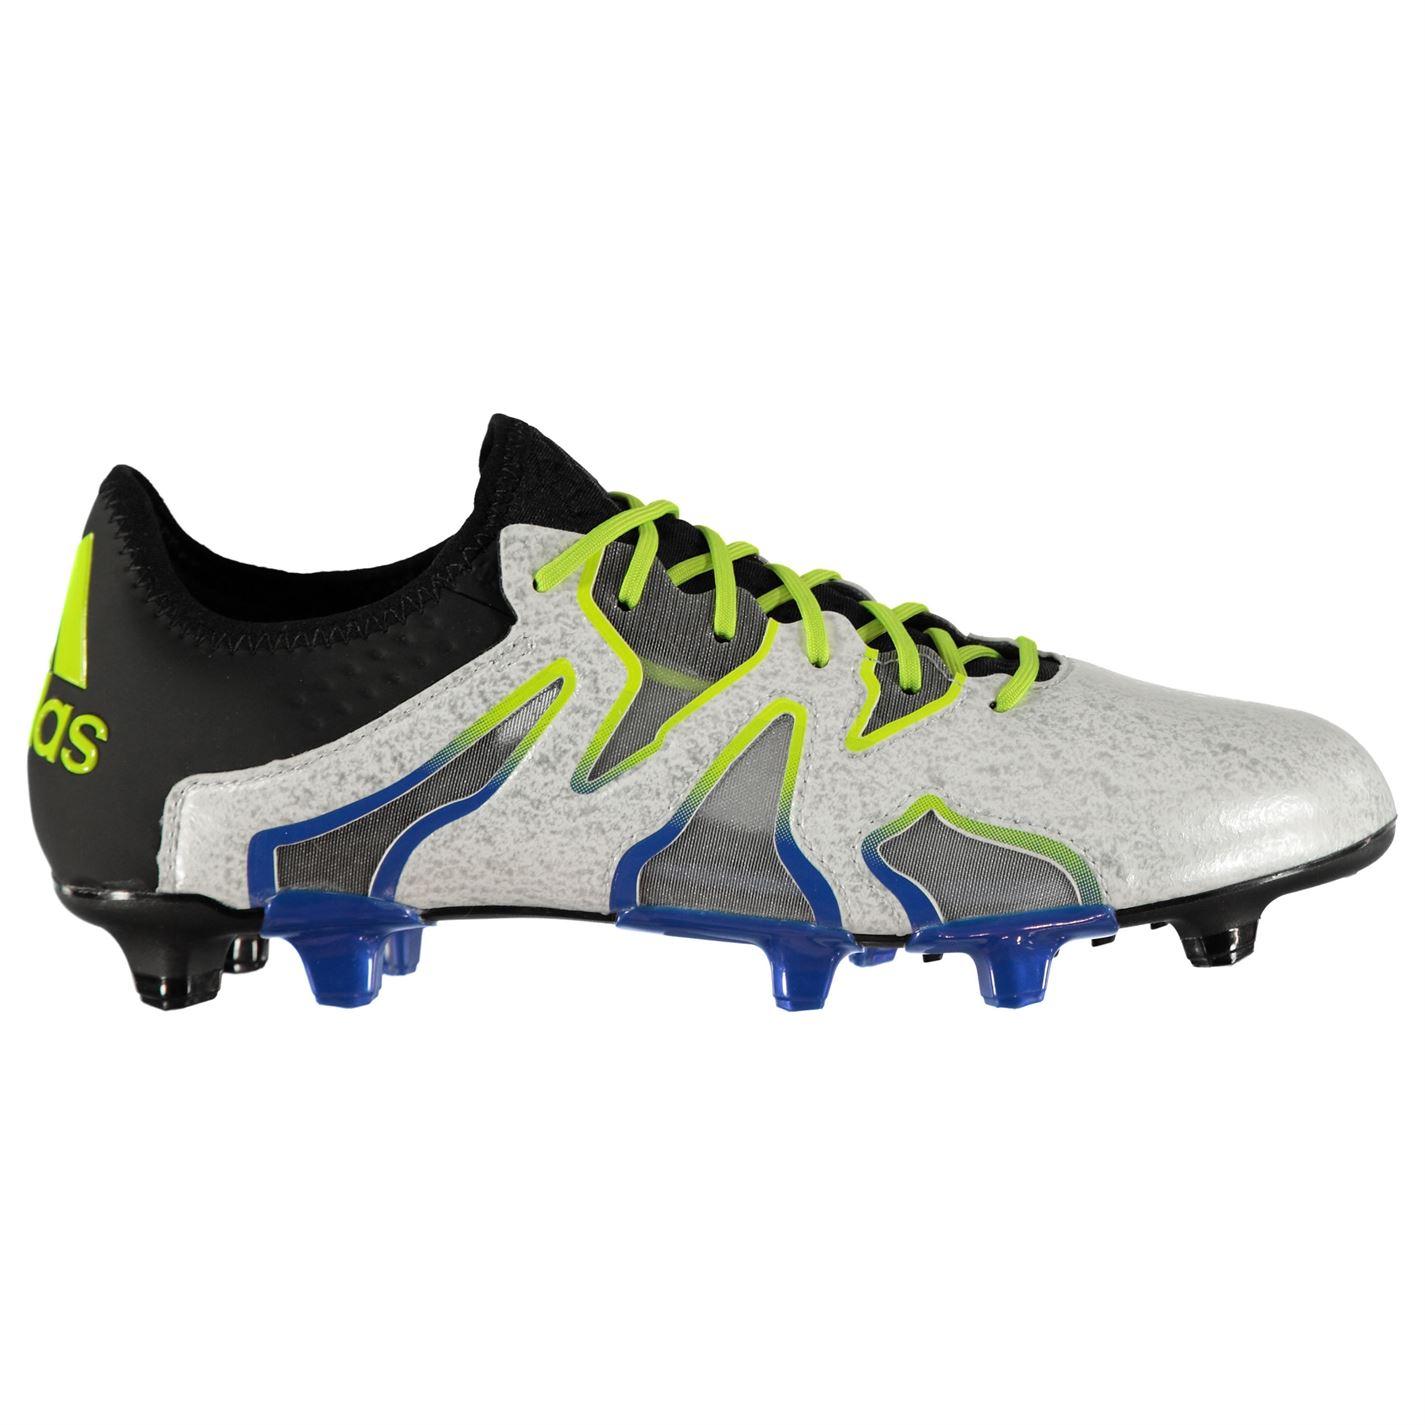 Adidas X 15+ SL FG AG Mens Football Boots